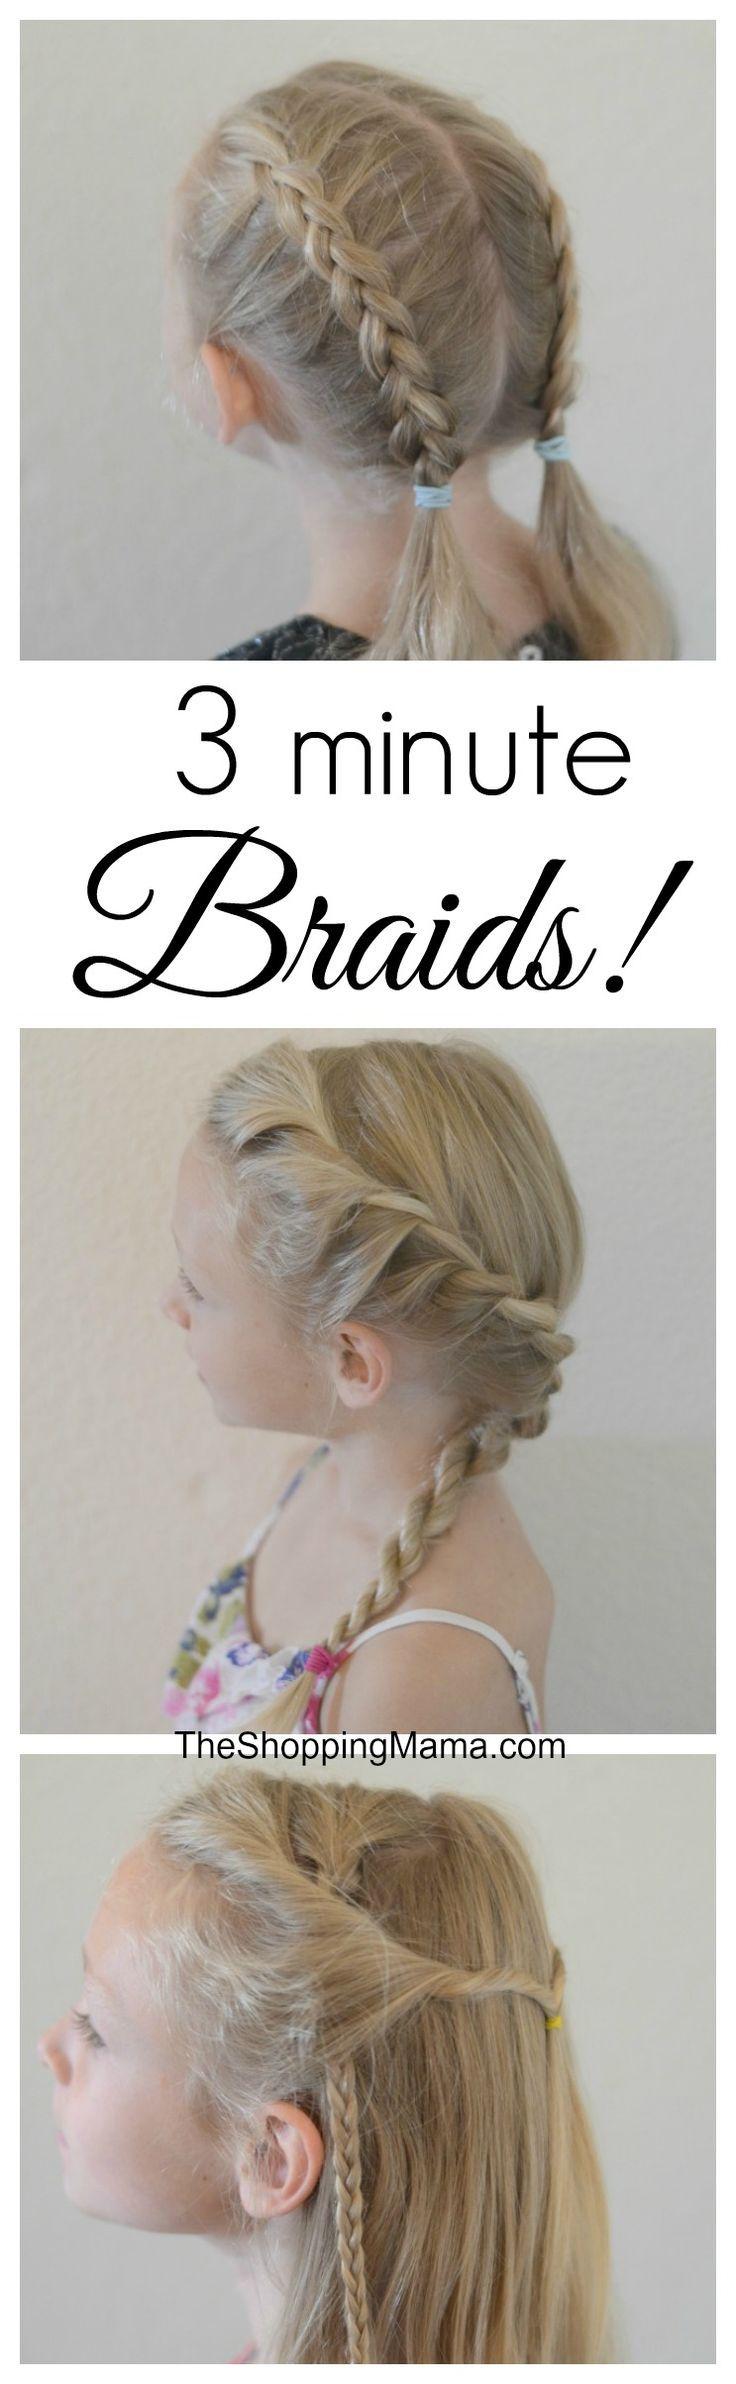 best girlsu hair images on pinterest girls hairdos hair dos and